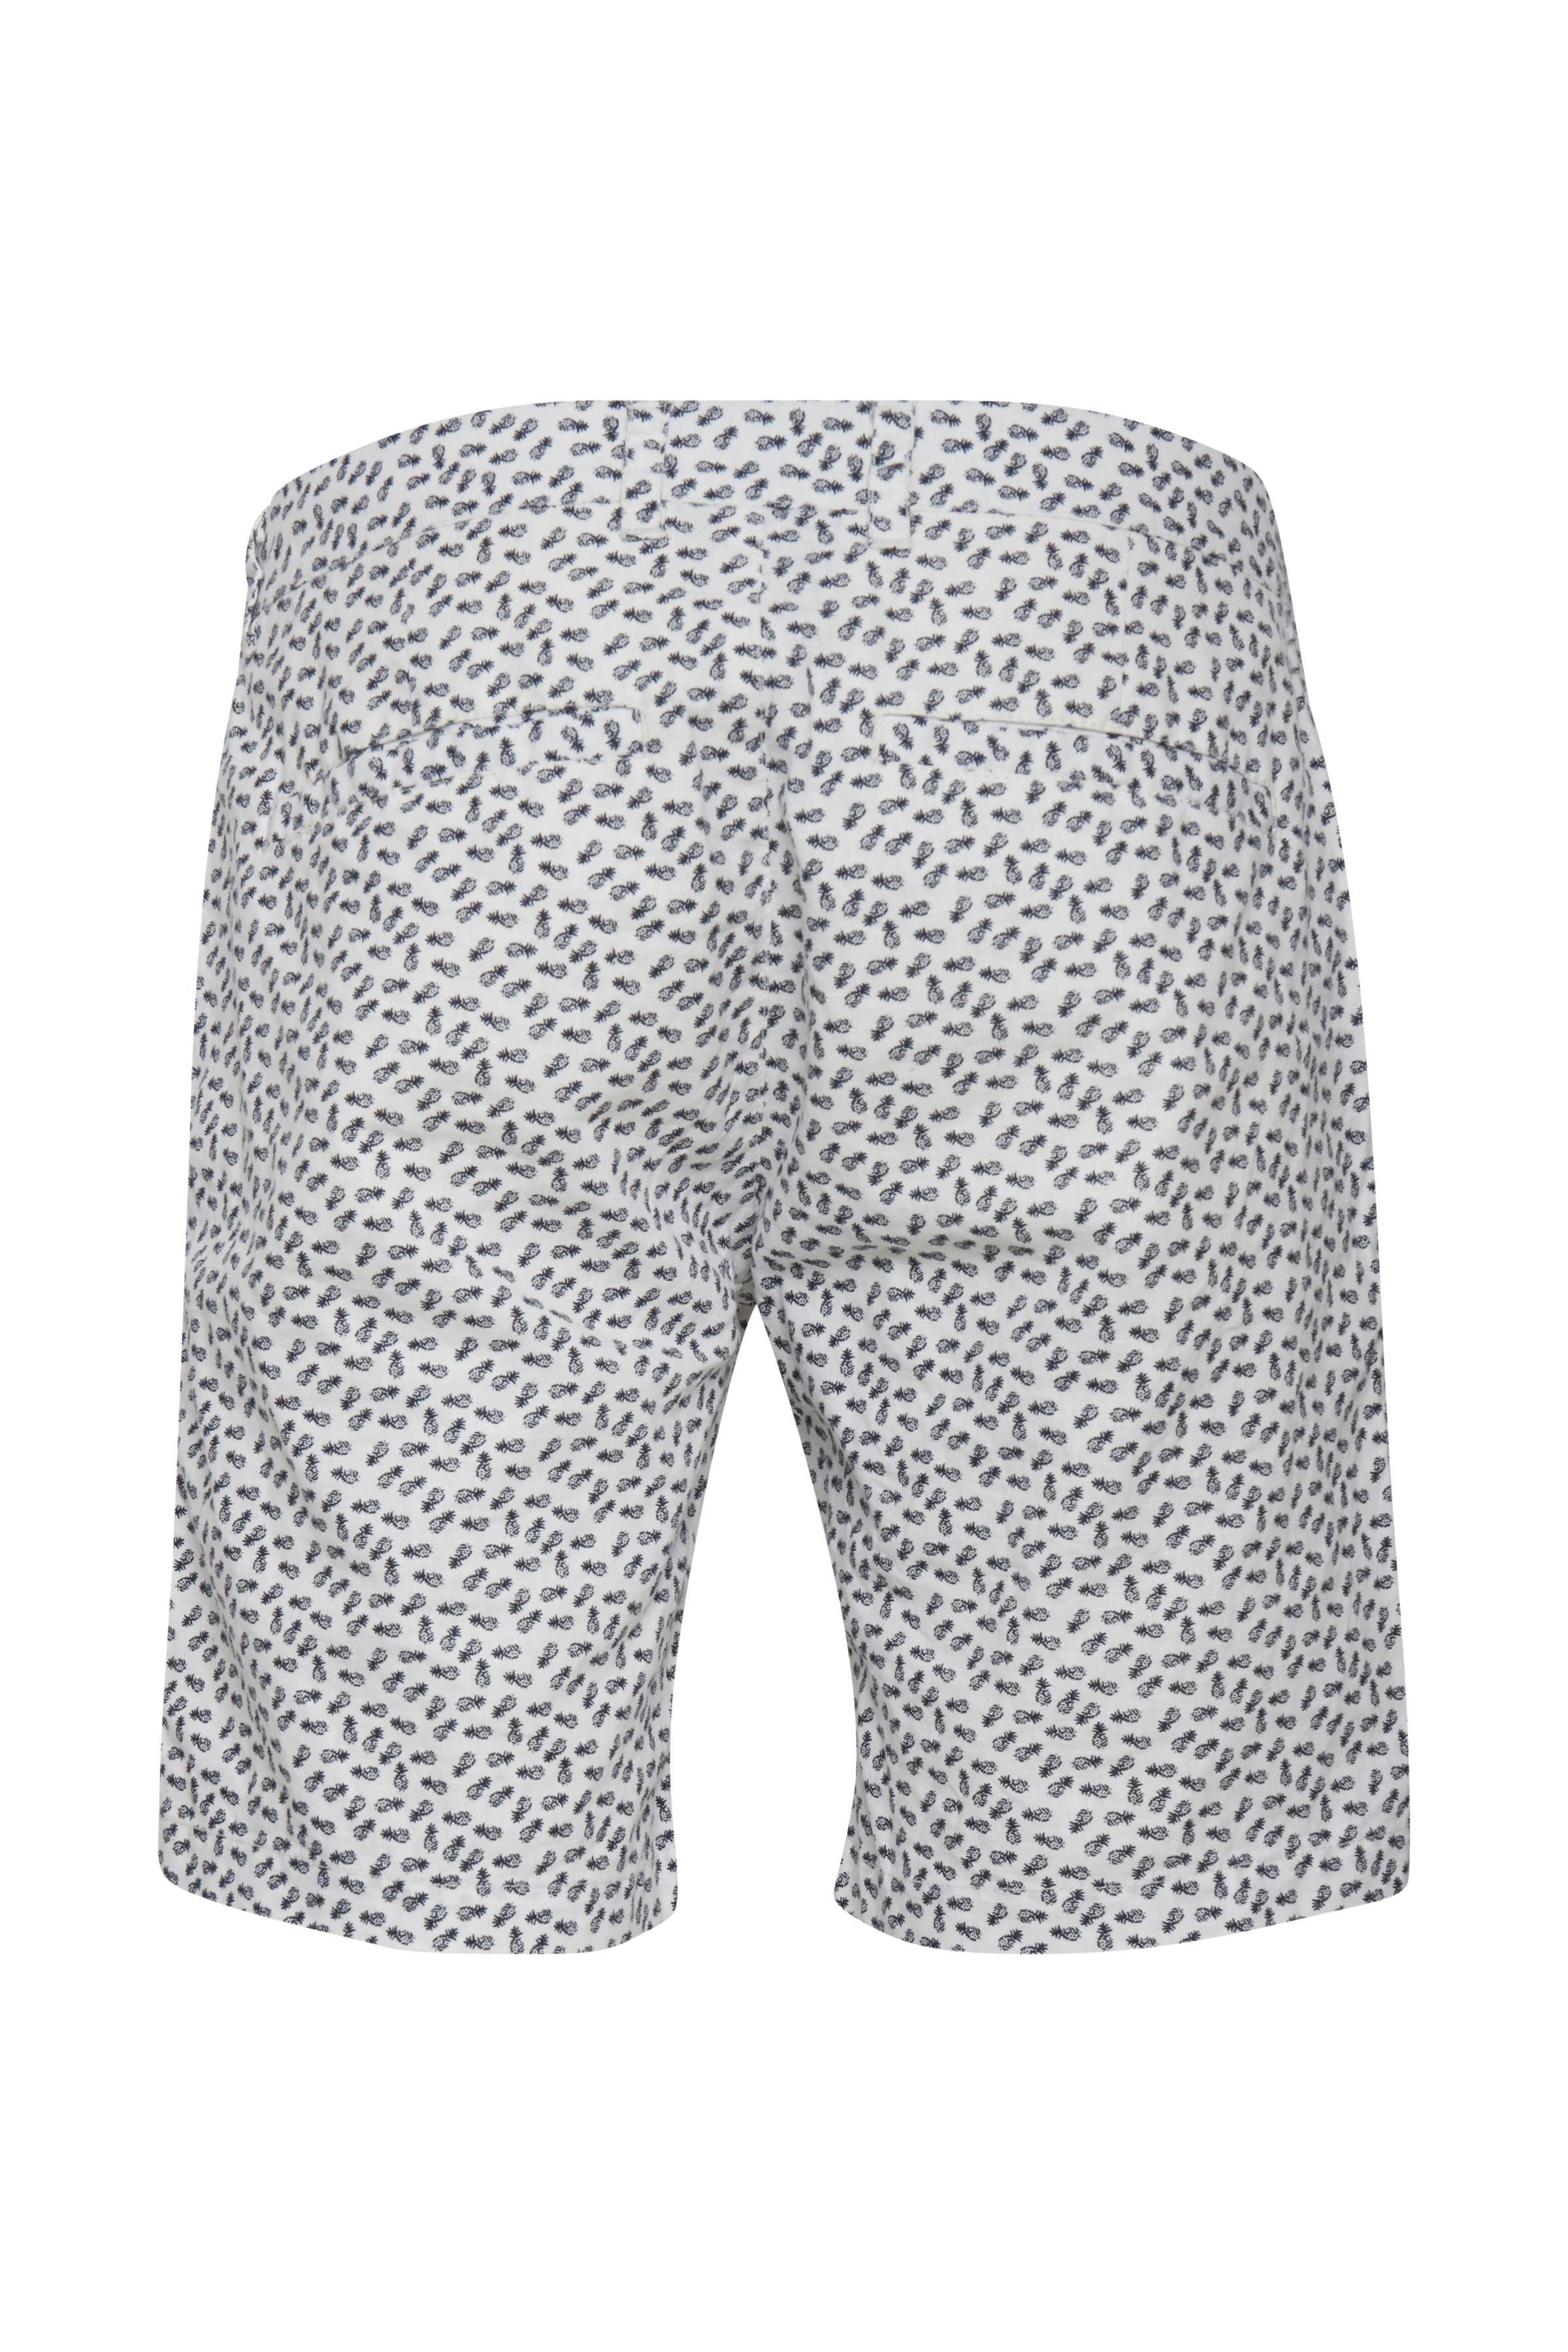 Offwhite Shorts – Køb Offwhite Shorts fra str. S-XXL her